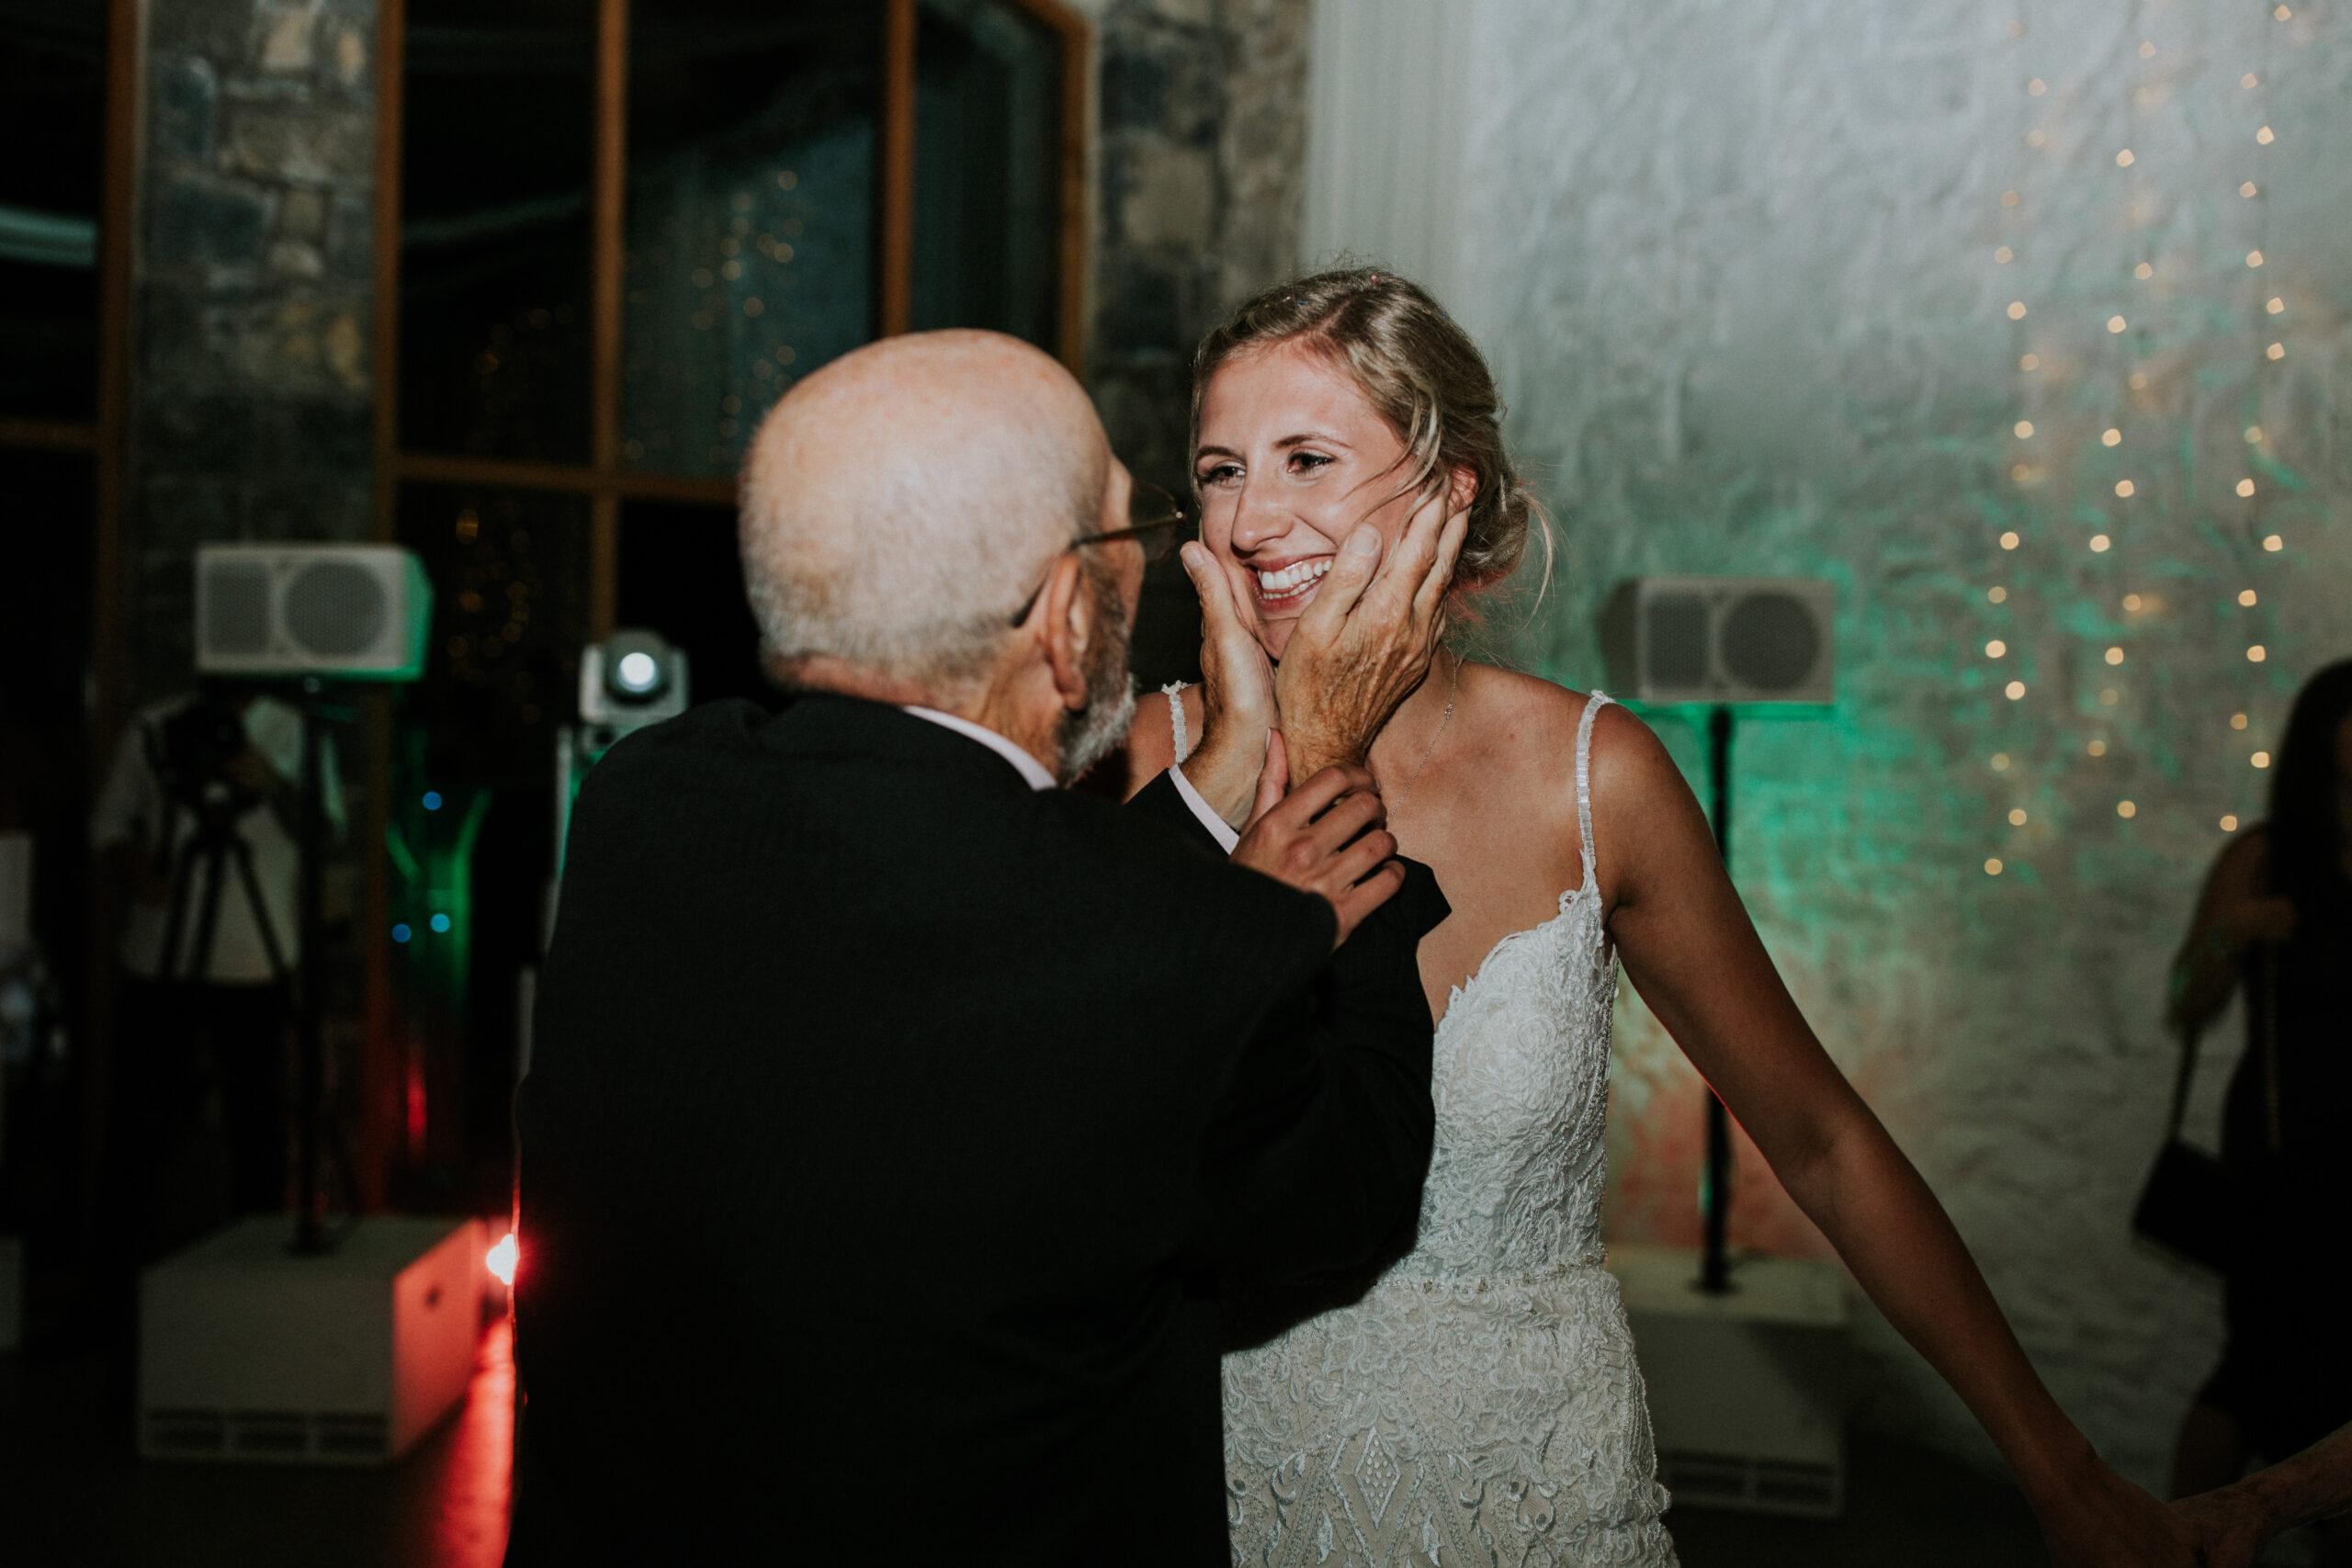 brides family member holding her face